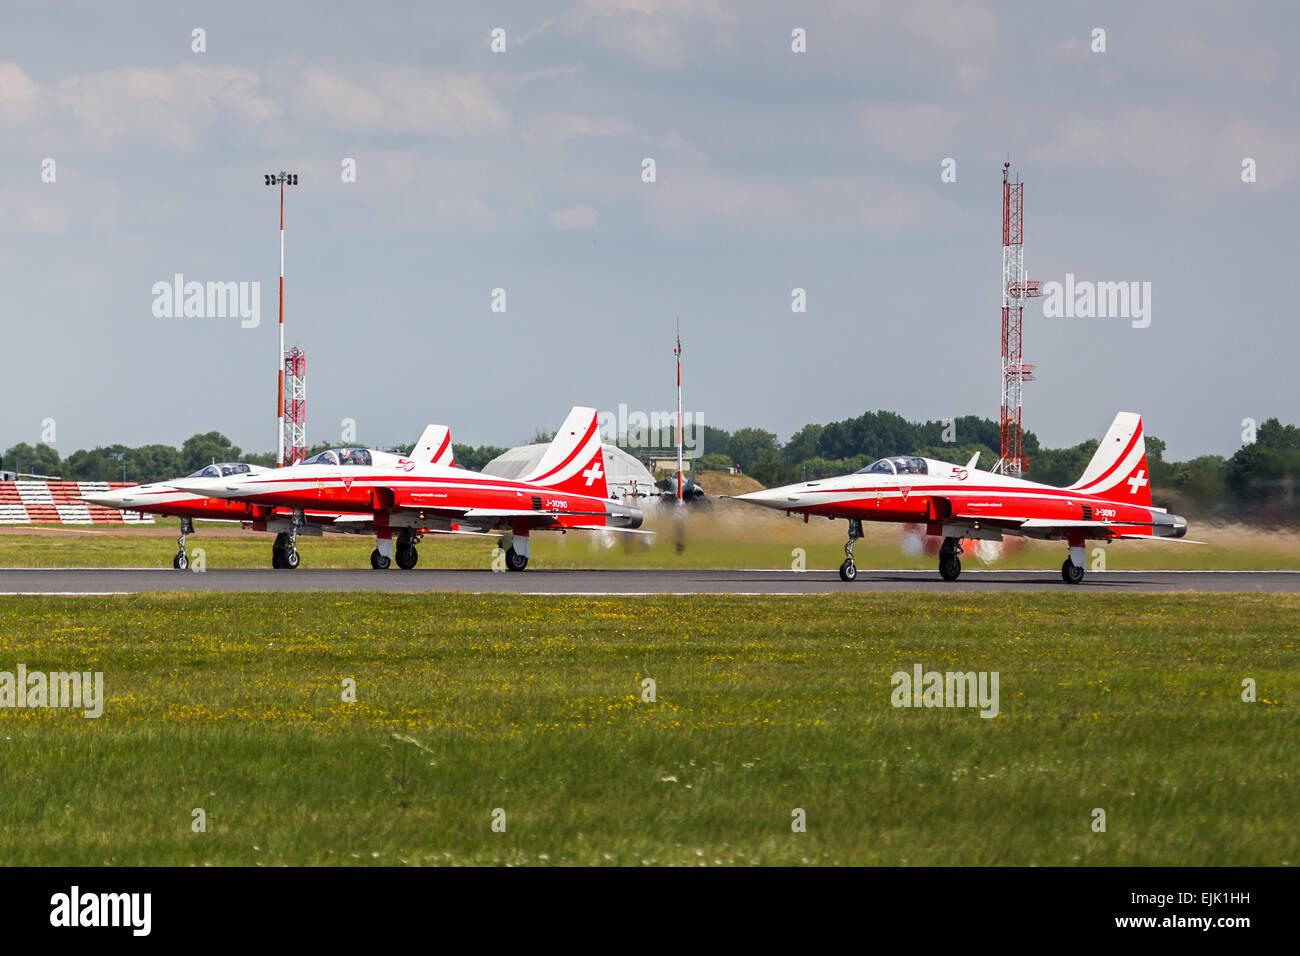 Patrouille Suisse at RAF Fairford. - Stock Image